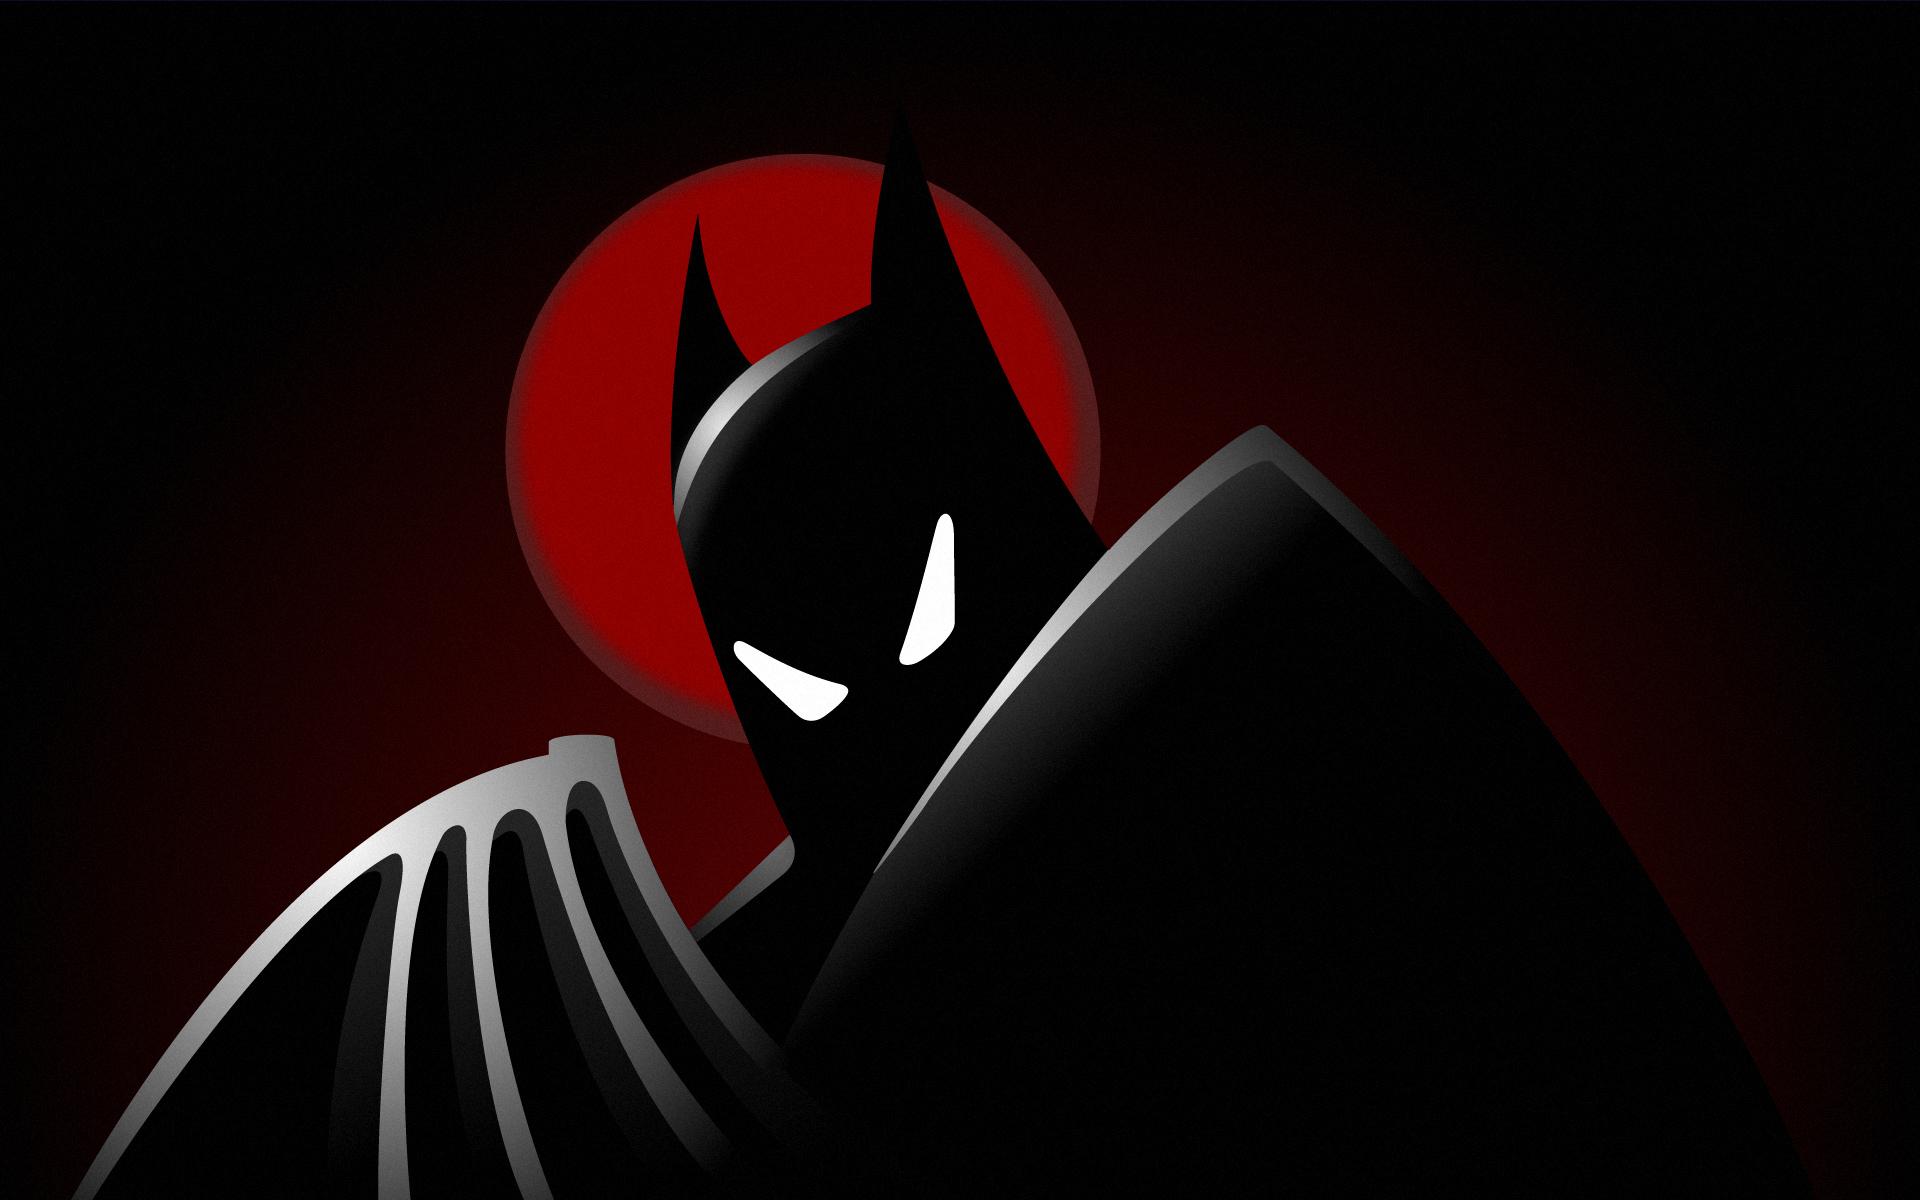 Batman the animated series hd wallpaper background - Batman wallpaper cartoon ...